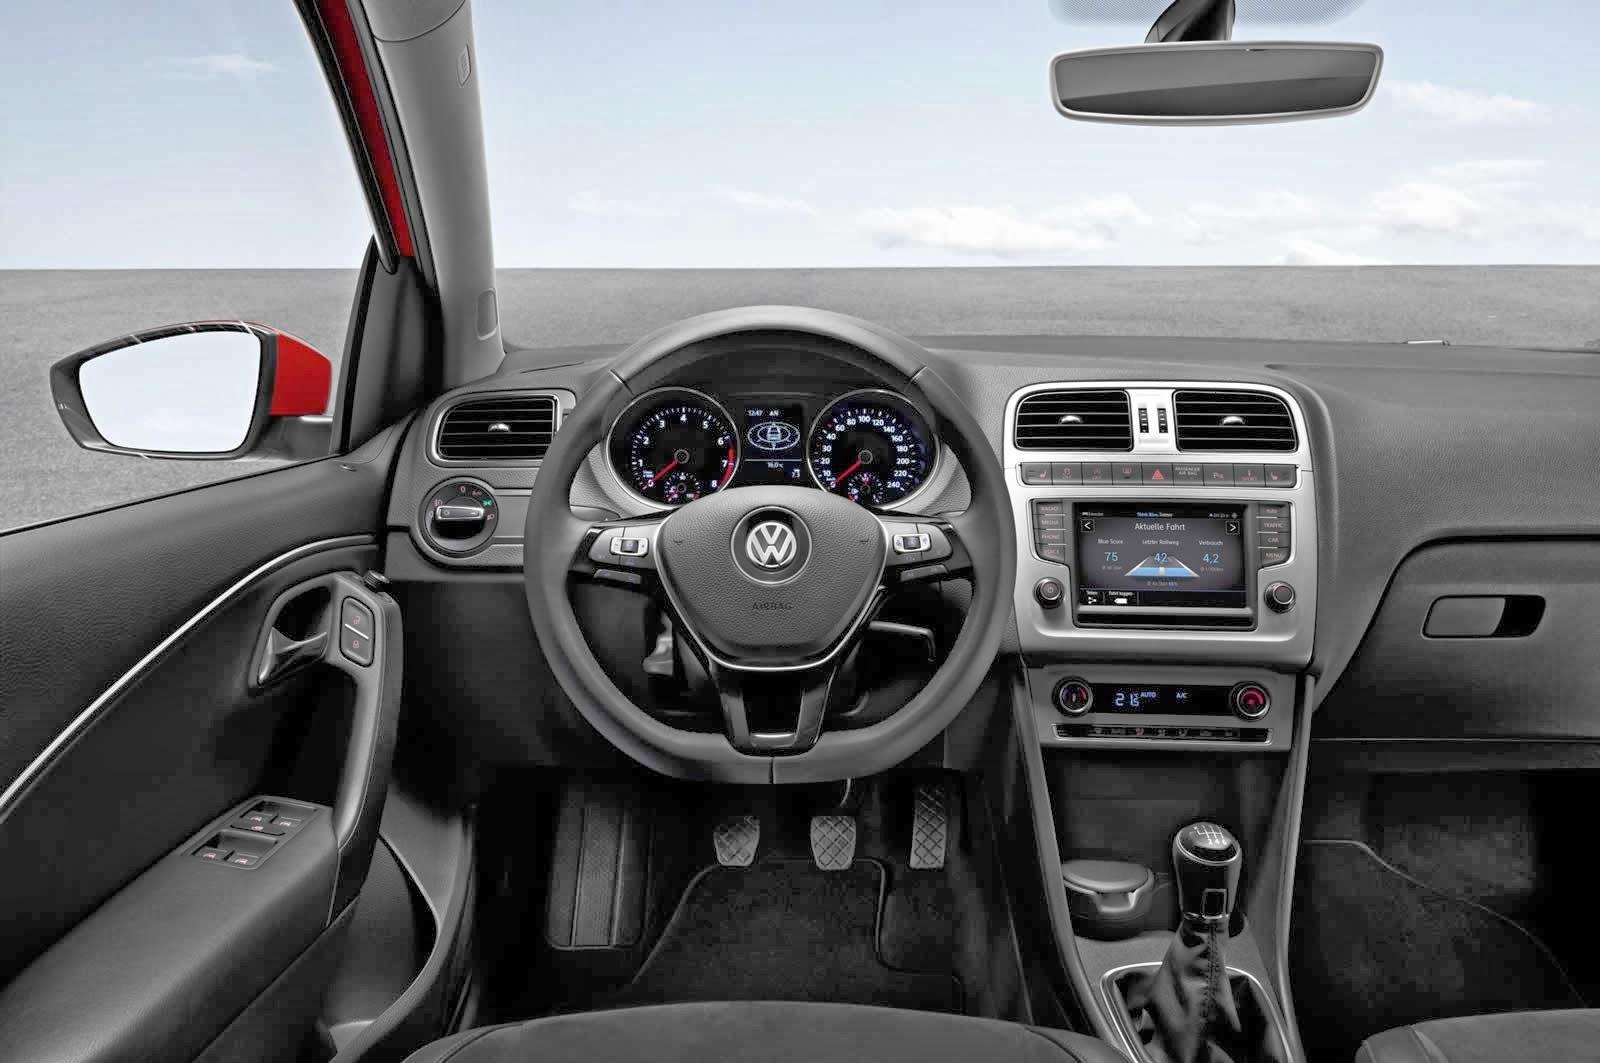 [Resim: Volkswagen+Polo+2.jpg]